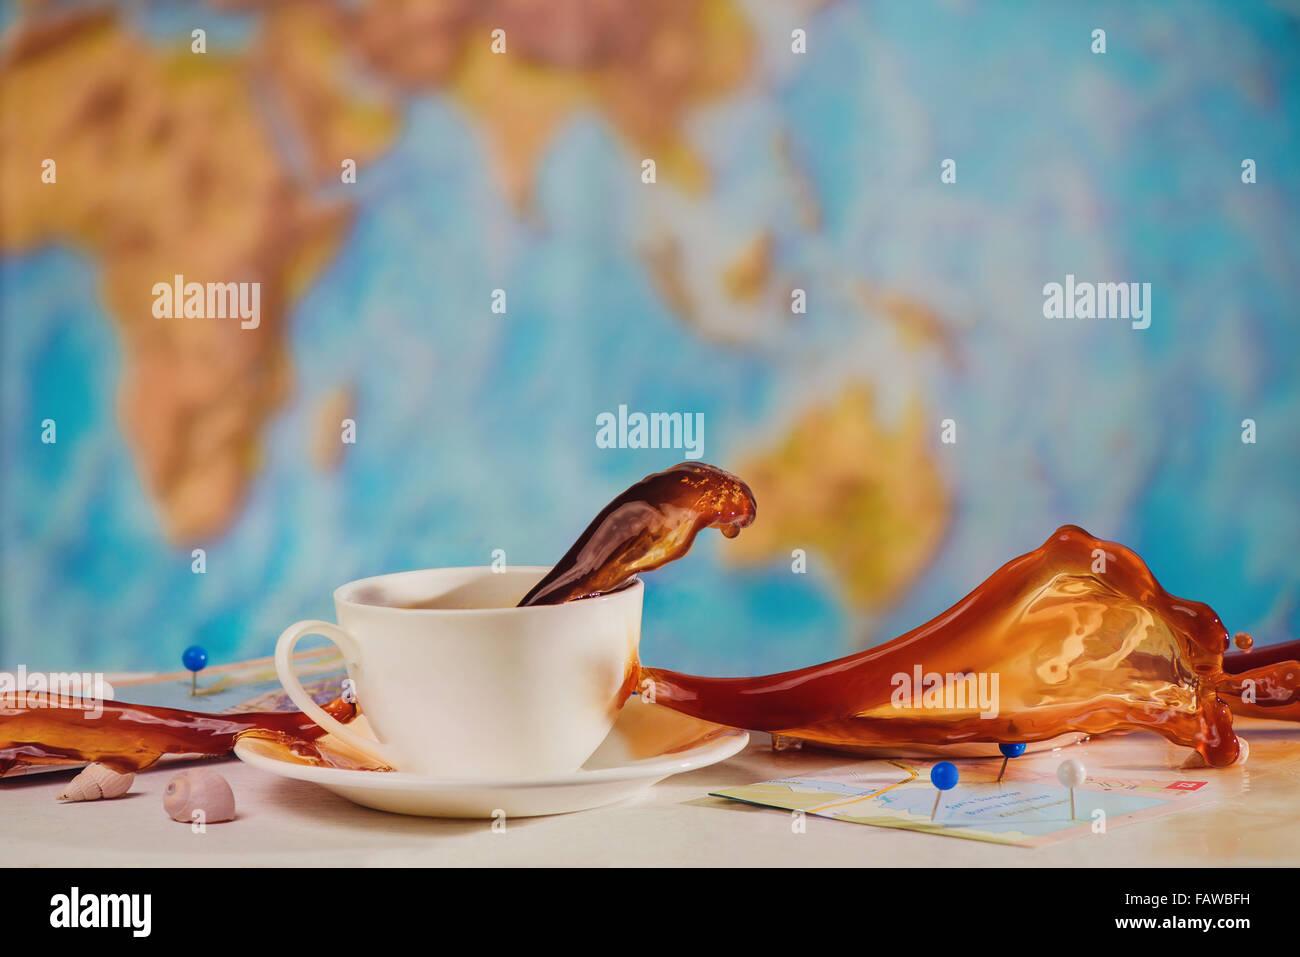 Café en cubierta Imagen De Stock